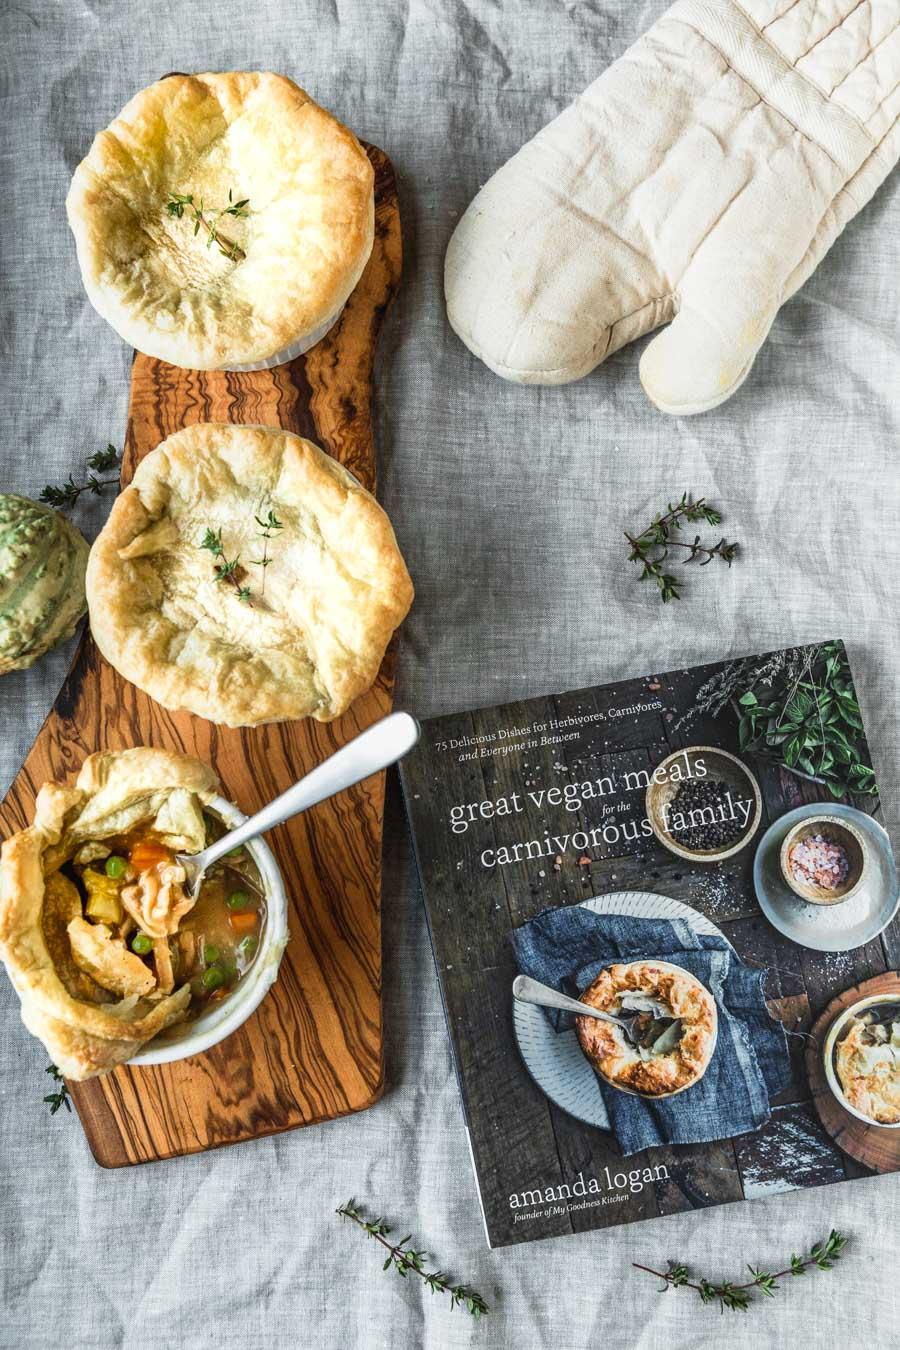 Tastes Like Chicken Pie recipe from the cookbook, Great Vegan Meals for the Carnivorous Family by Amanda Logan. Photo by Kari of Beautiful Ingredient. #vegan #vegandinner #plantbased #familydinner #dinner #chickenpotpie #potpie #veganchicken #veganforcarnivore #cookbook #recipe